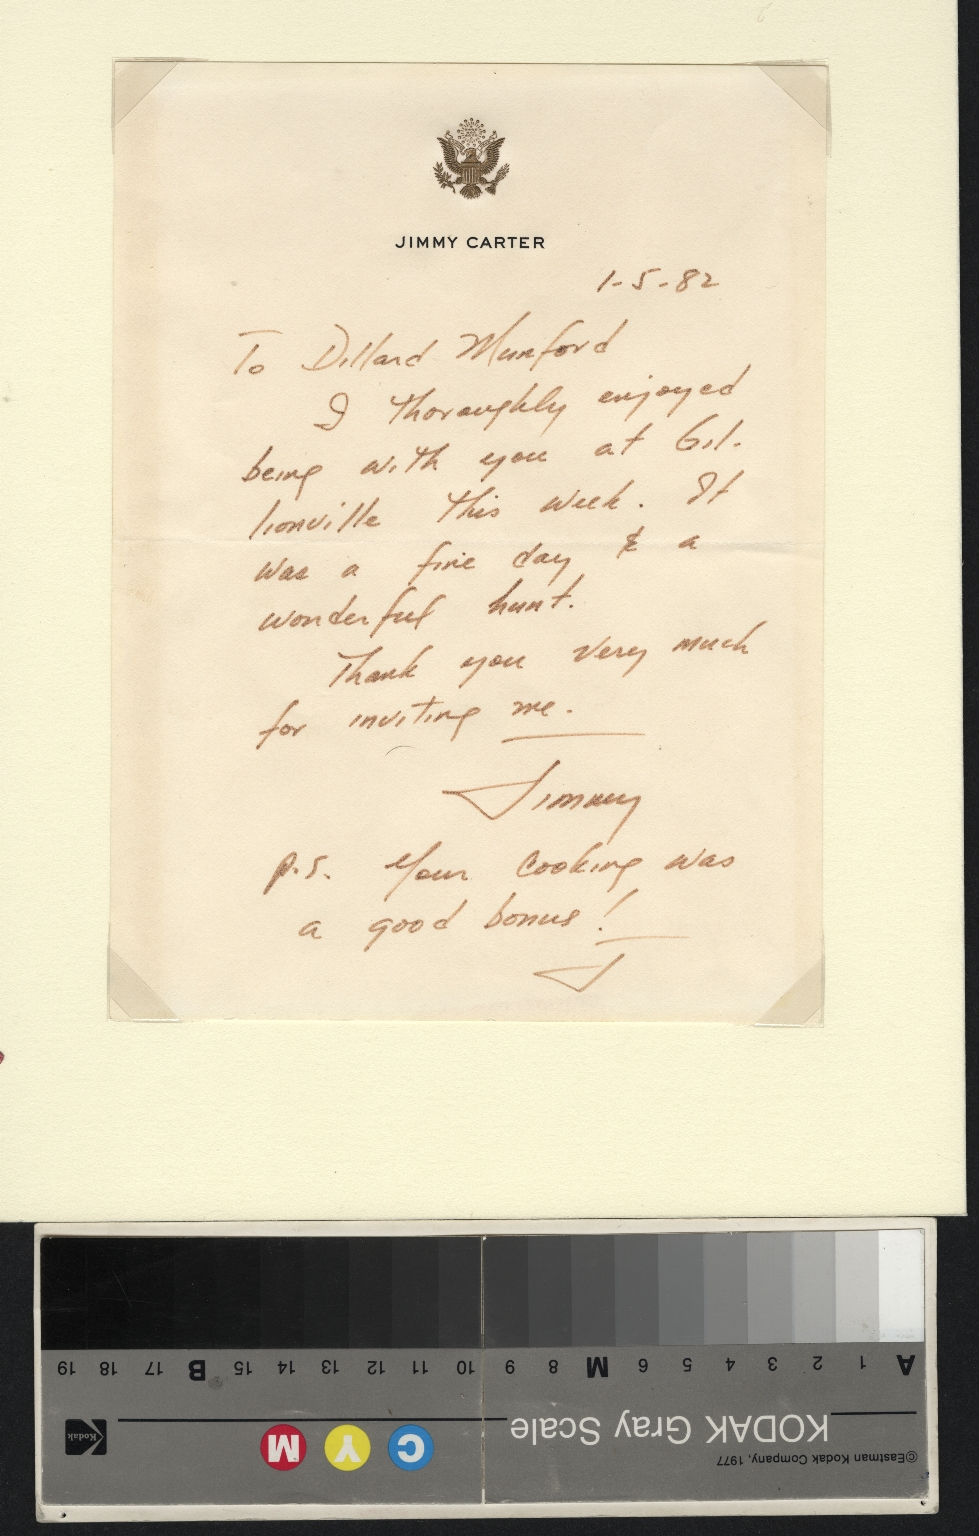 Jimmy Carter letter to Dillard Munford